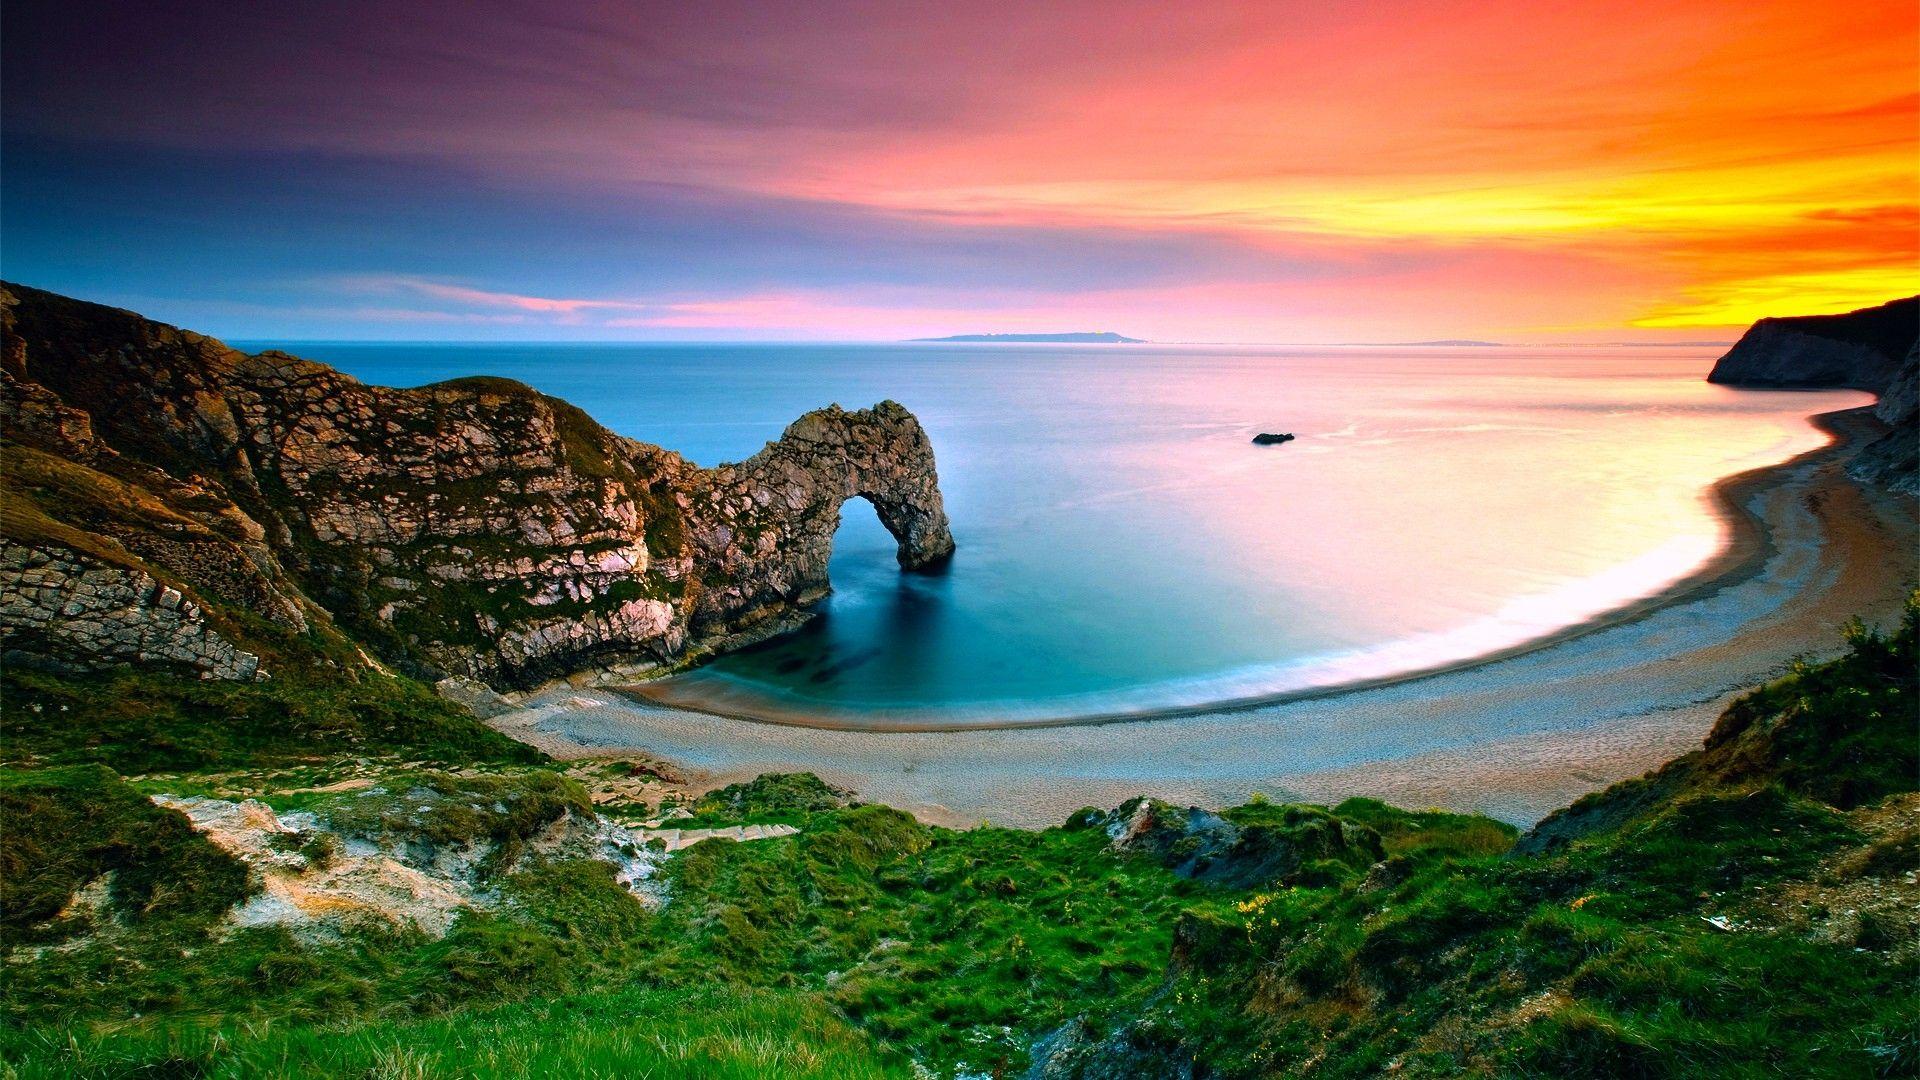 landscap wallpaper |  landscape ocean beach hd desktop wallpaper